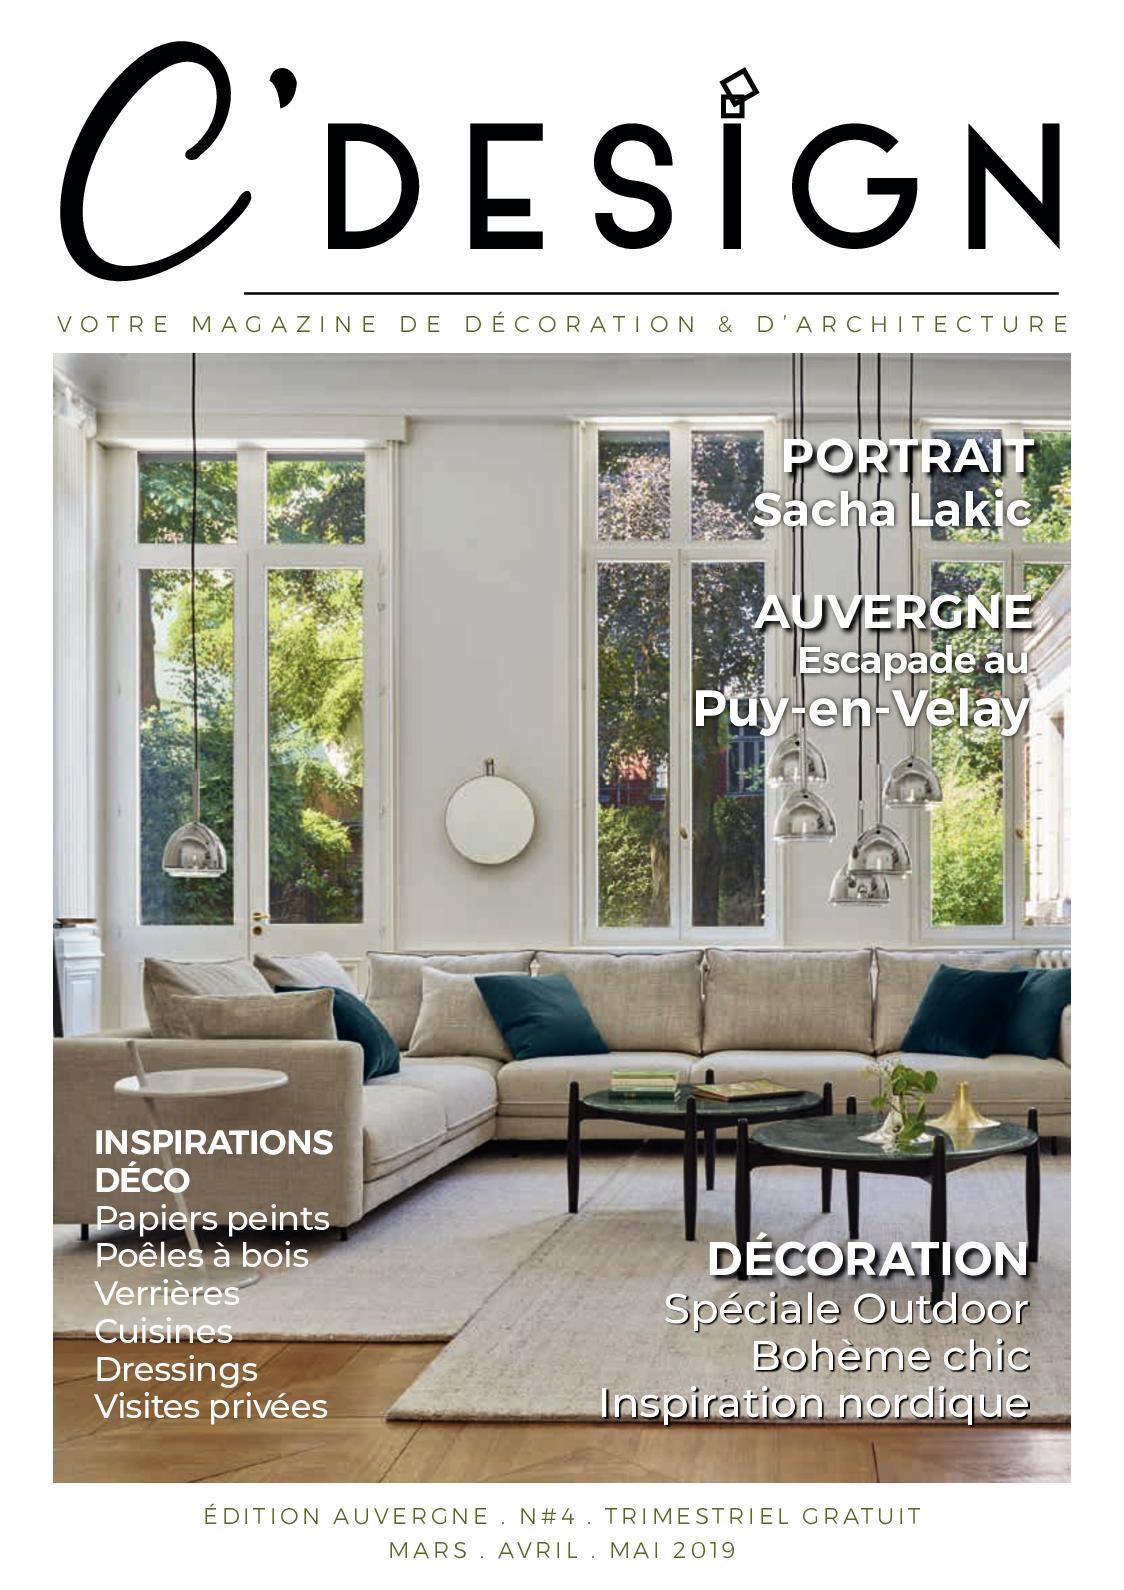 Design Creation Le Puy En Velay calaméo - magazine c'design 4